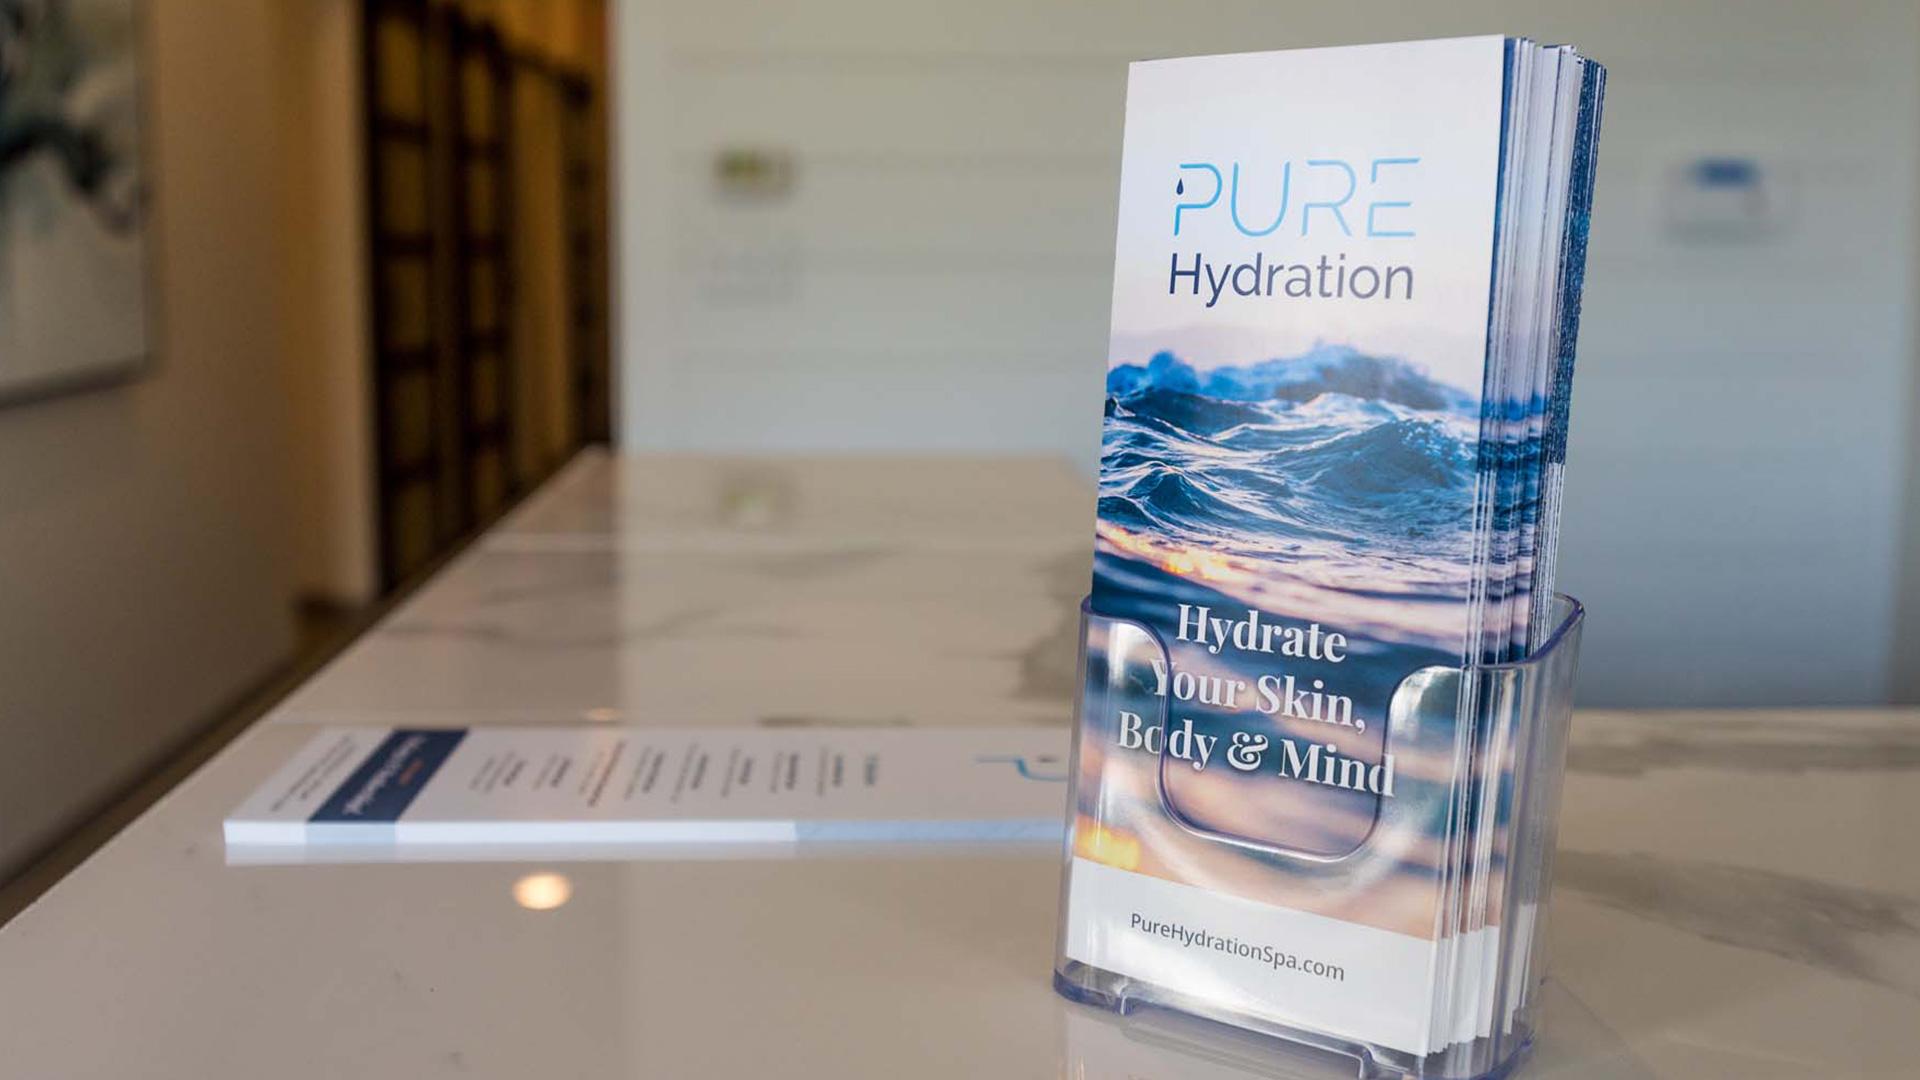 purehydration_1920x1080-brochureondesk.jpg